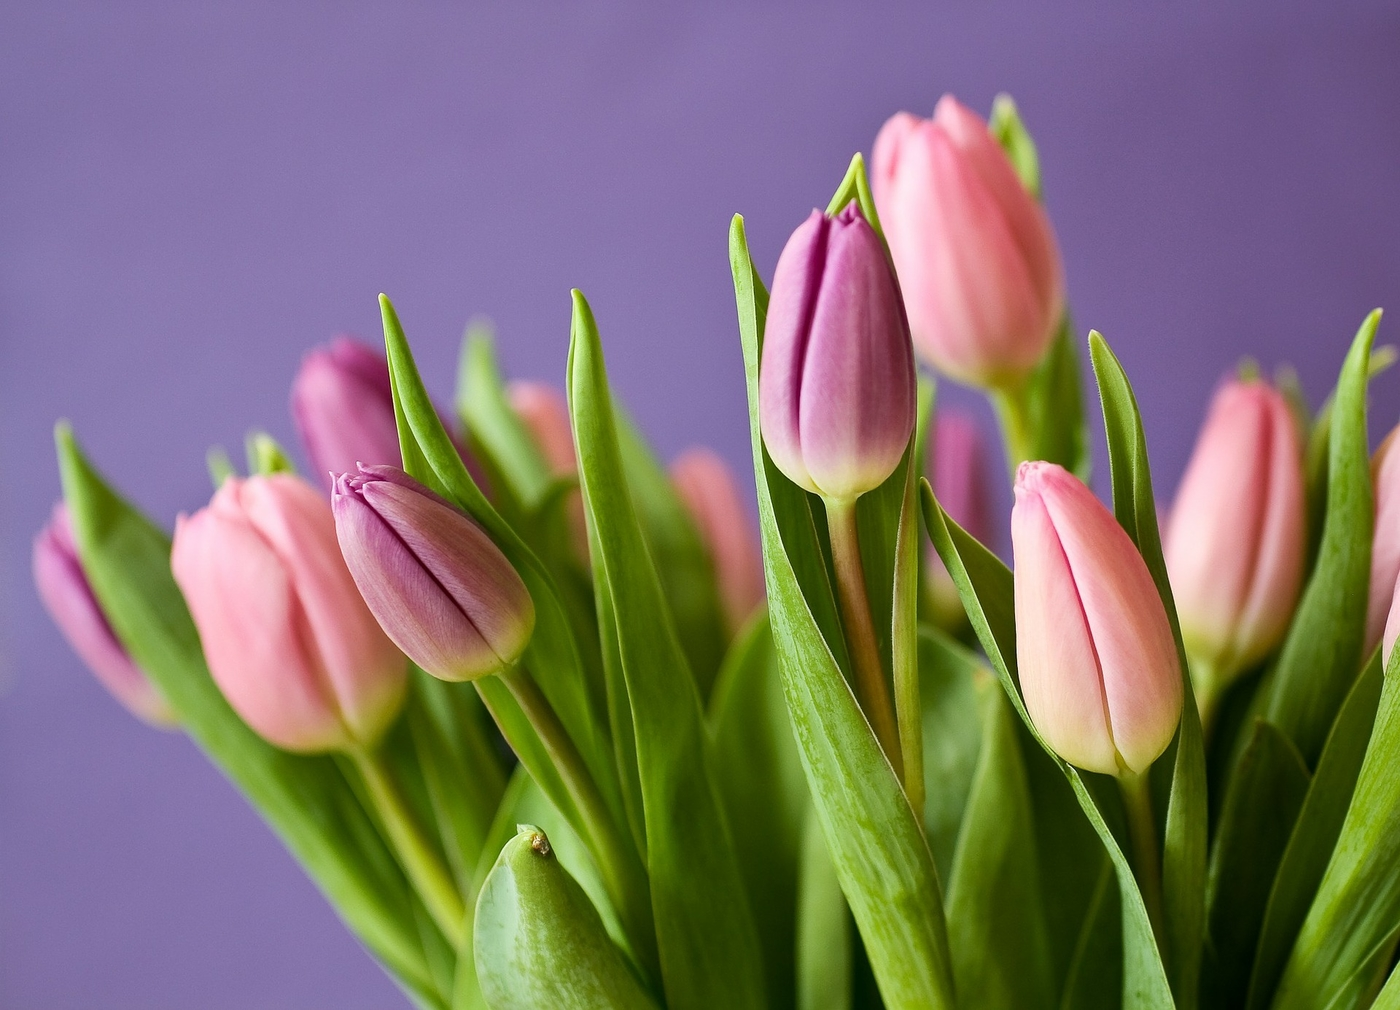 tulips-320151_1920.jpg